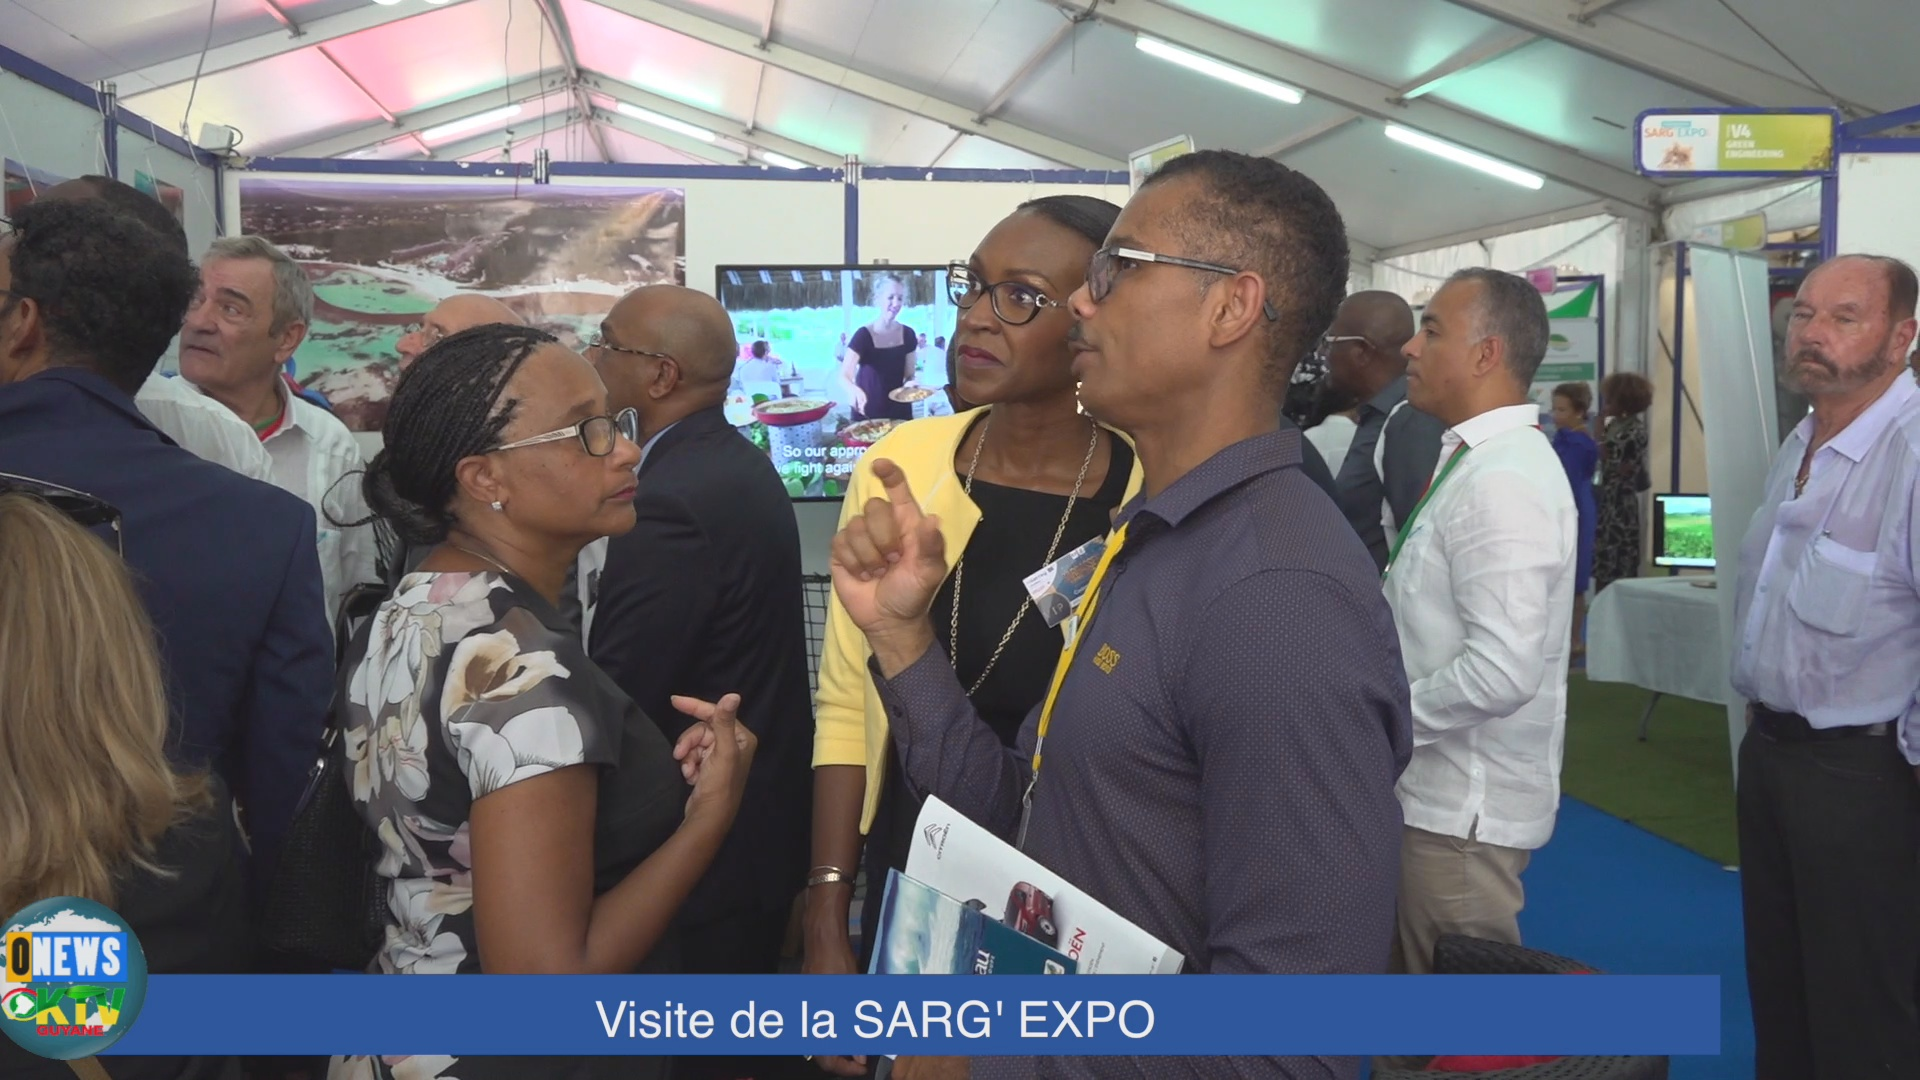 [Vidéo] ONEWS Guadeloupe. Le Salon Sarg-Expo